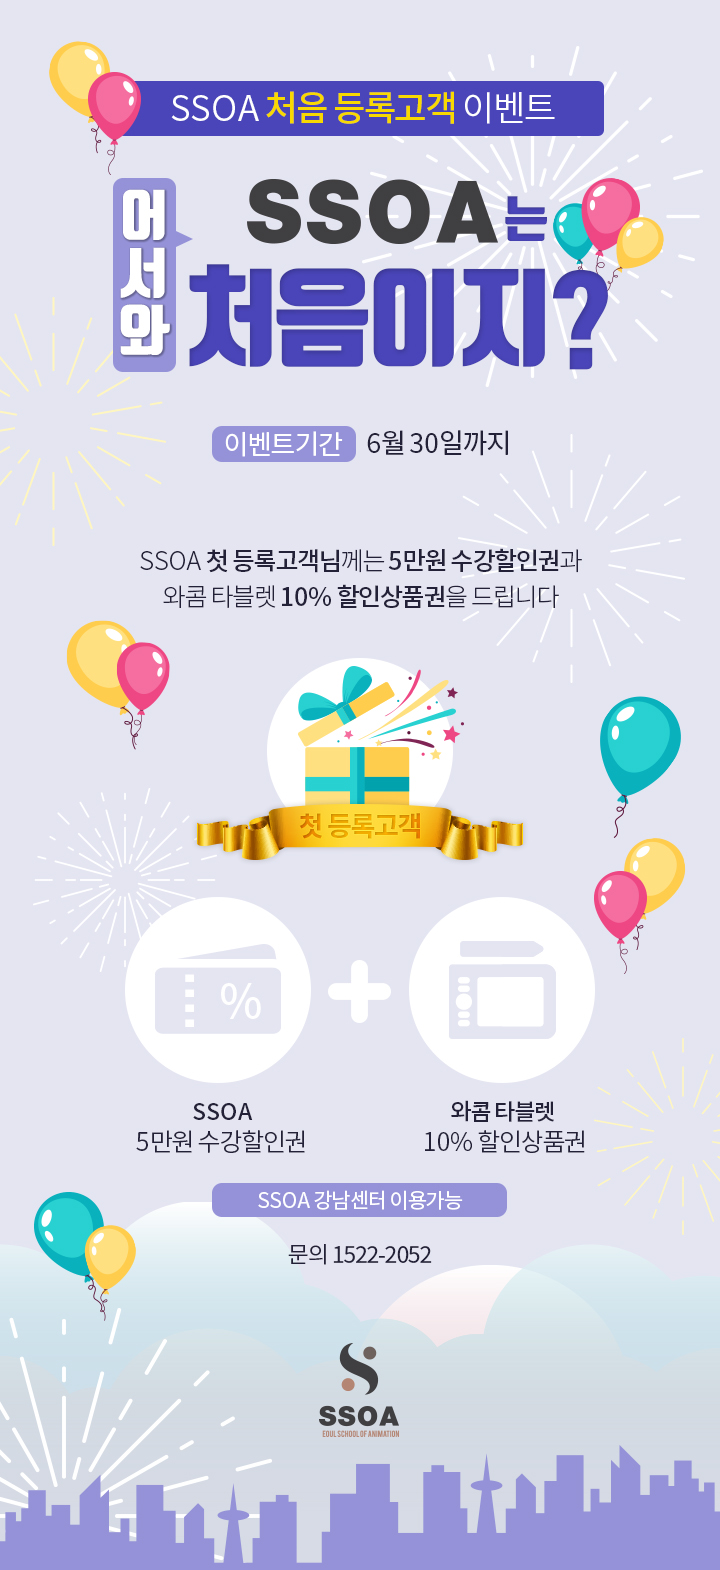 SSOA 첫등록고객 대상 이벤트